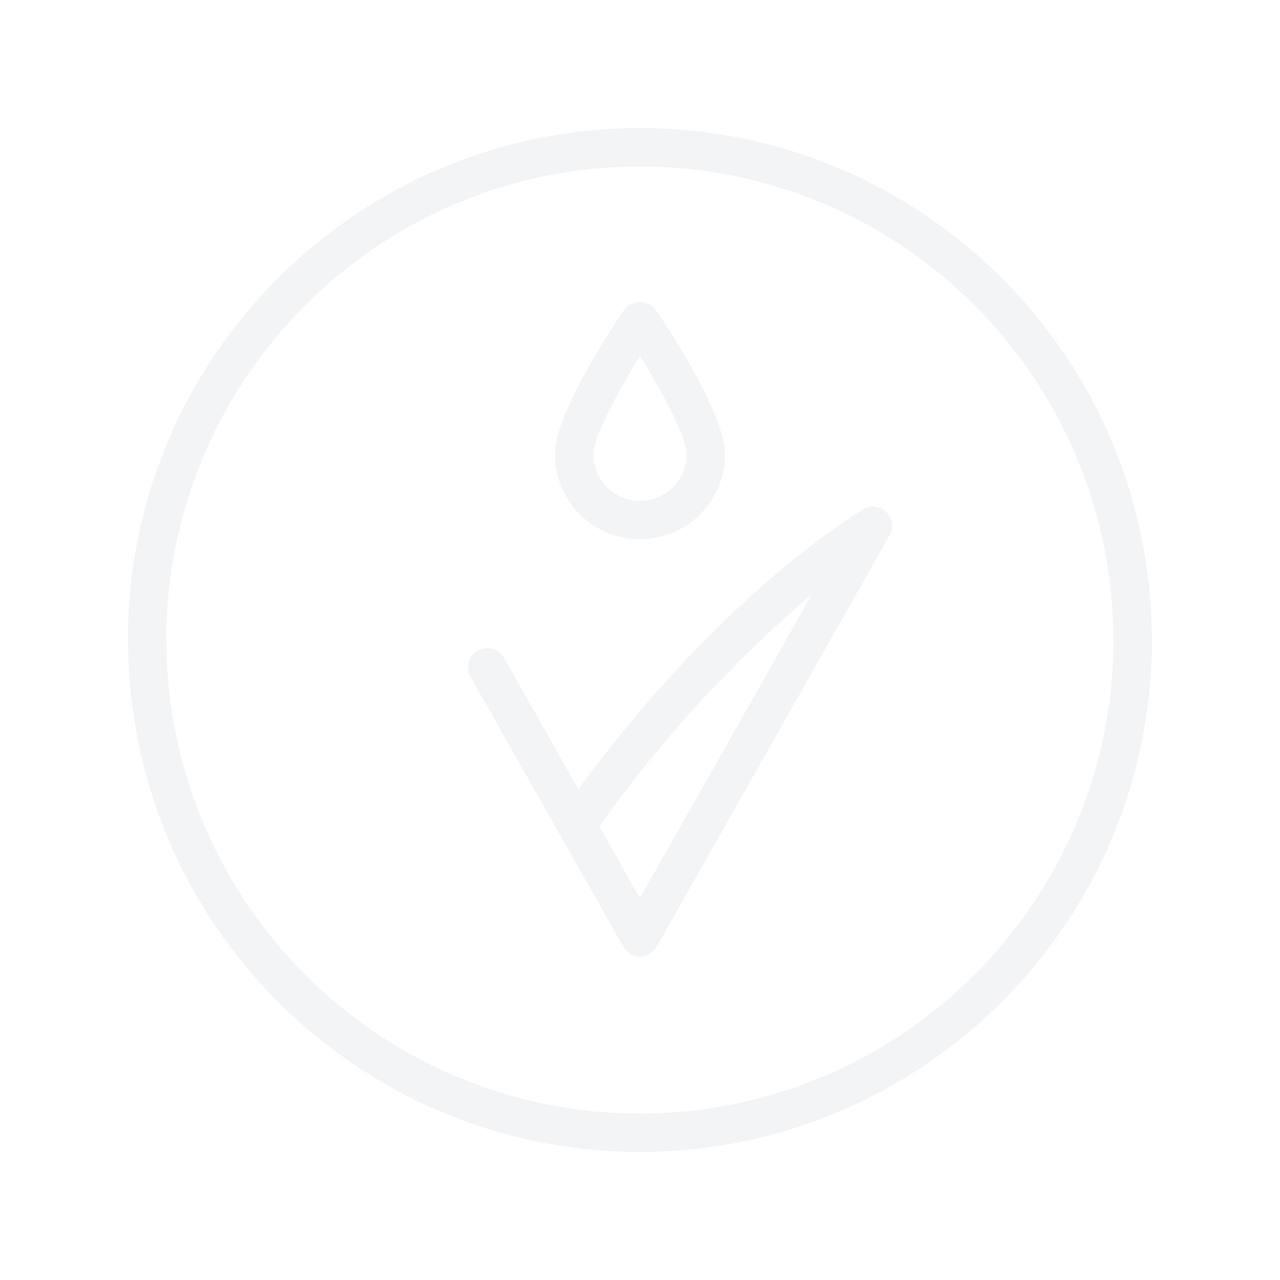 LÖWENGRIP Long Lasting Quick Hair Treatment 100ml